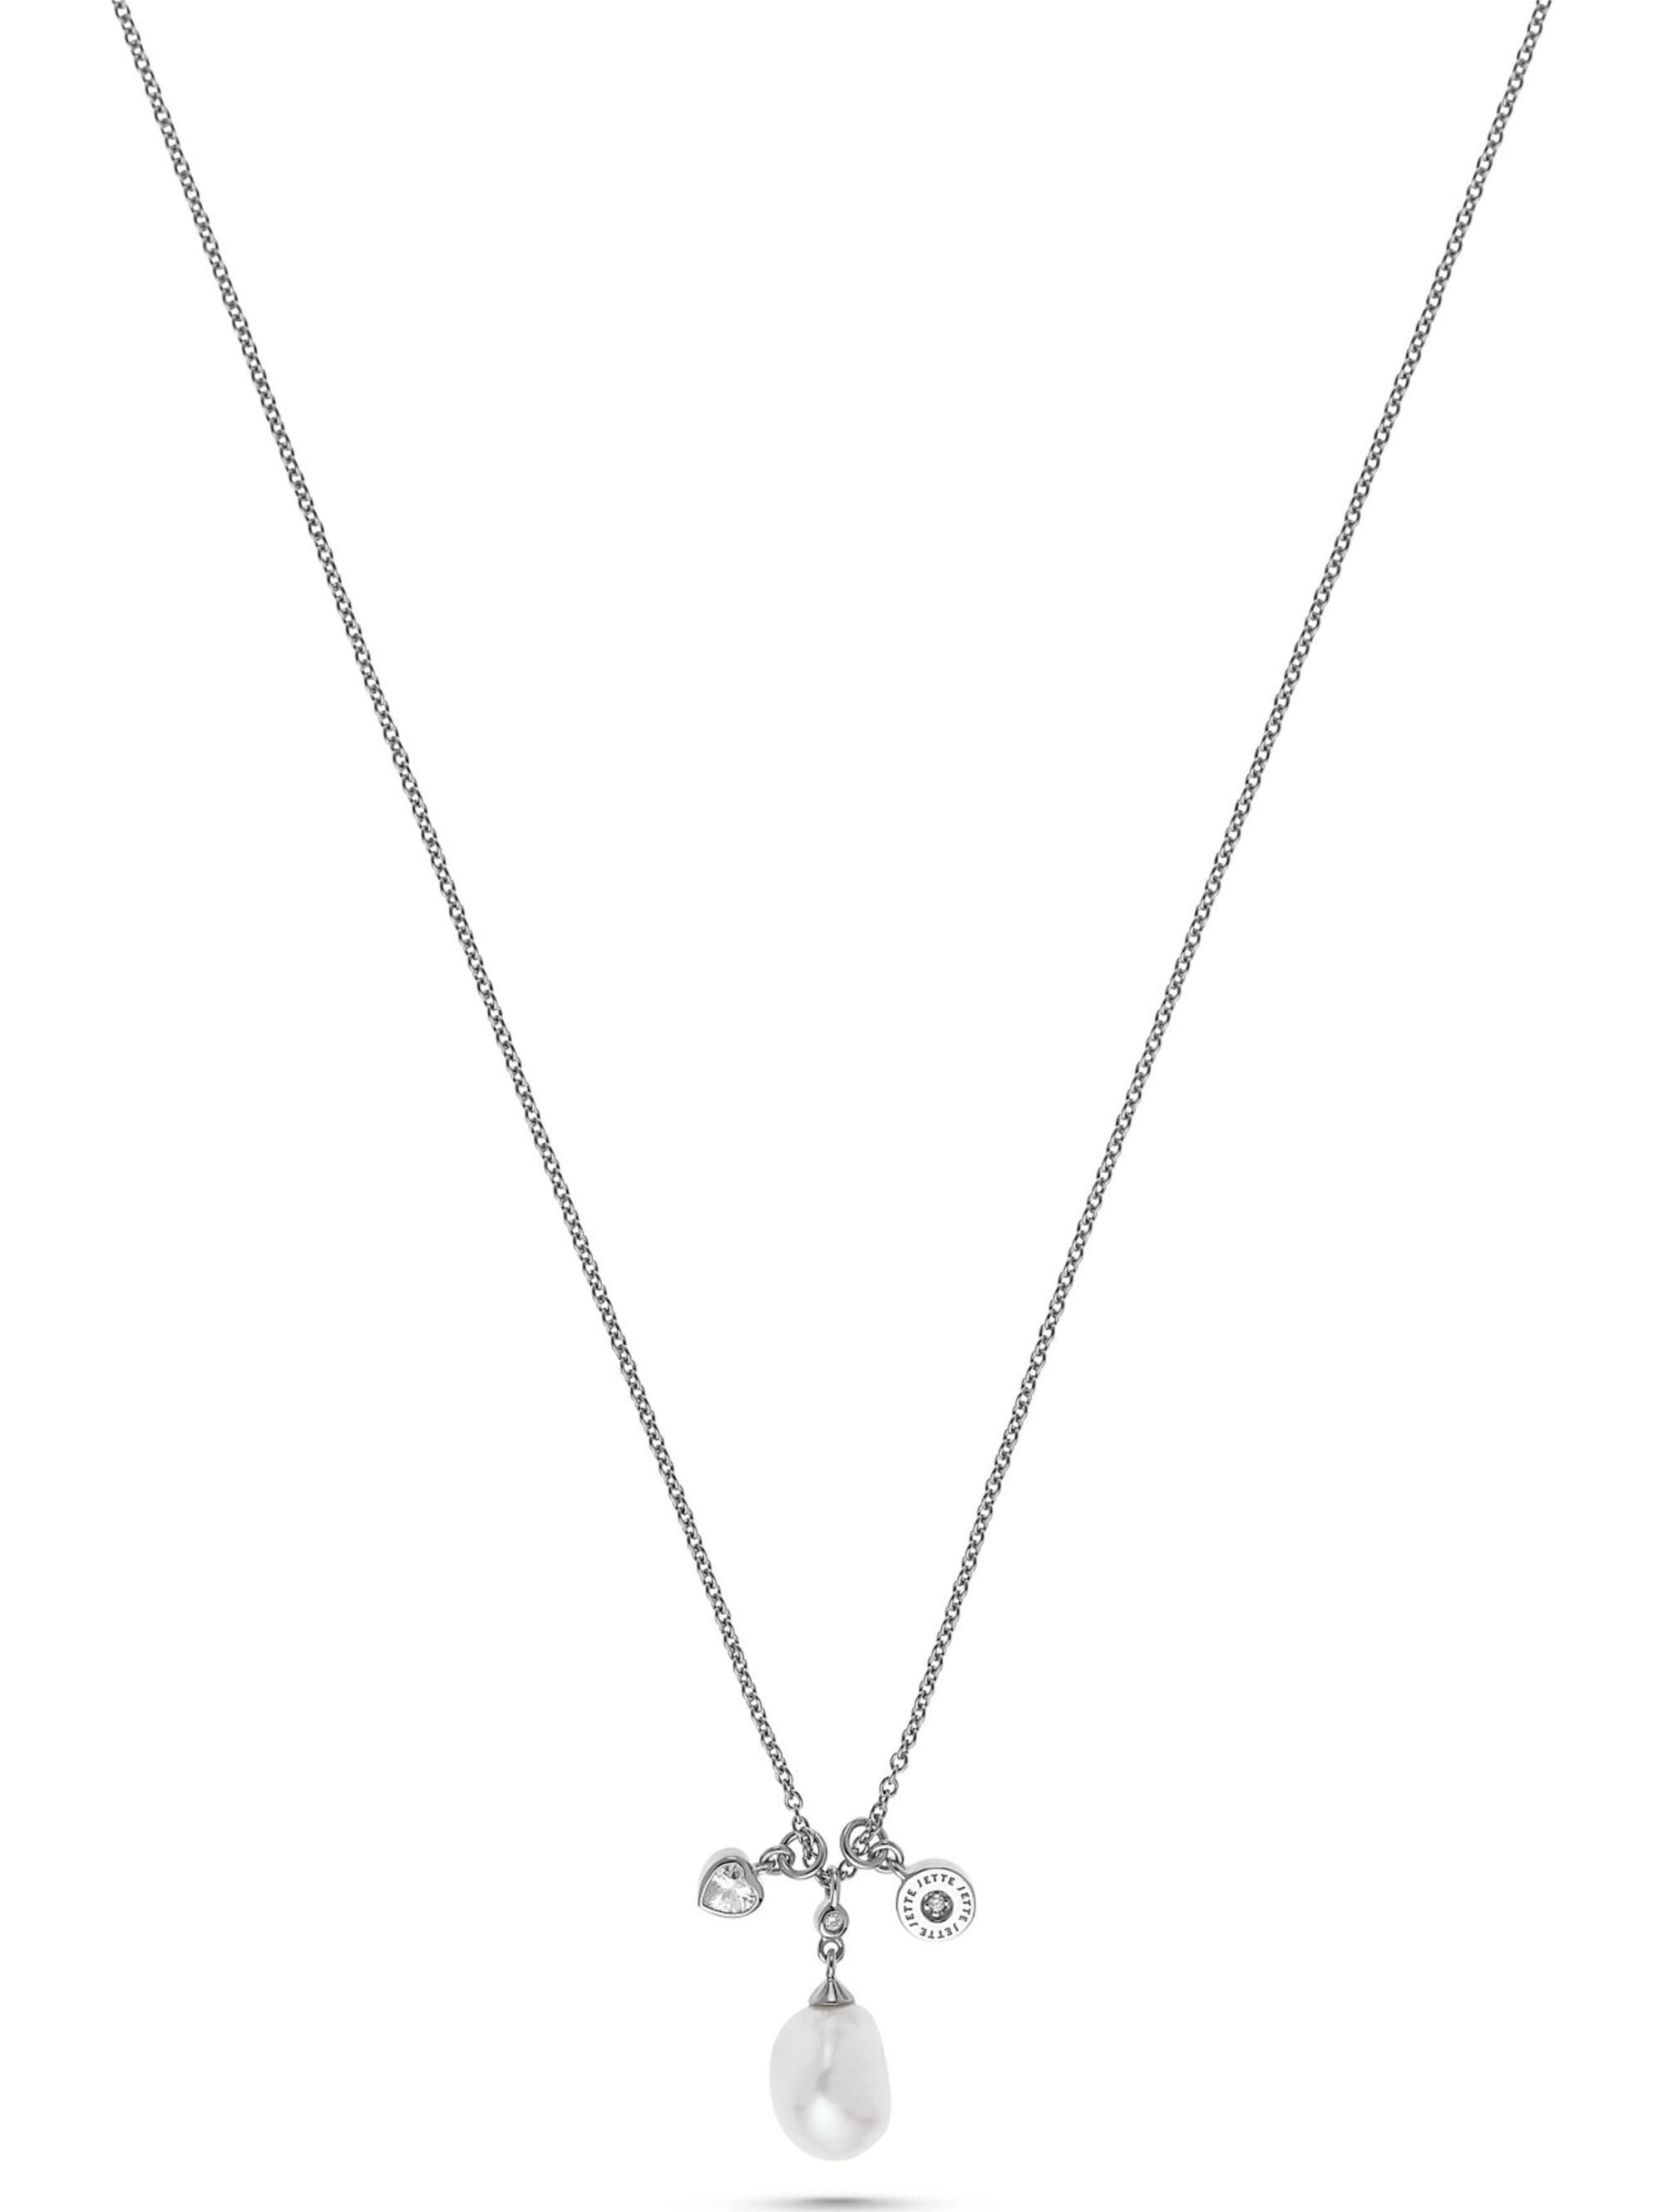 Jette JETTE Silver Damen-Kette Tail 925er Silber Perle JKKRg